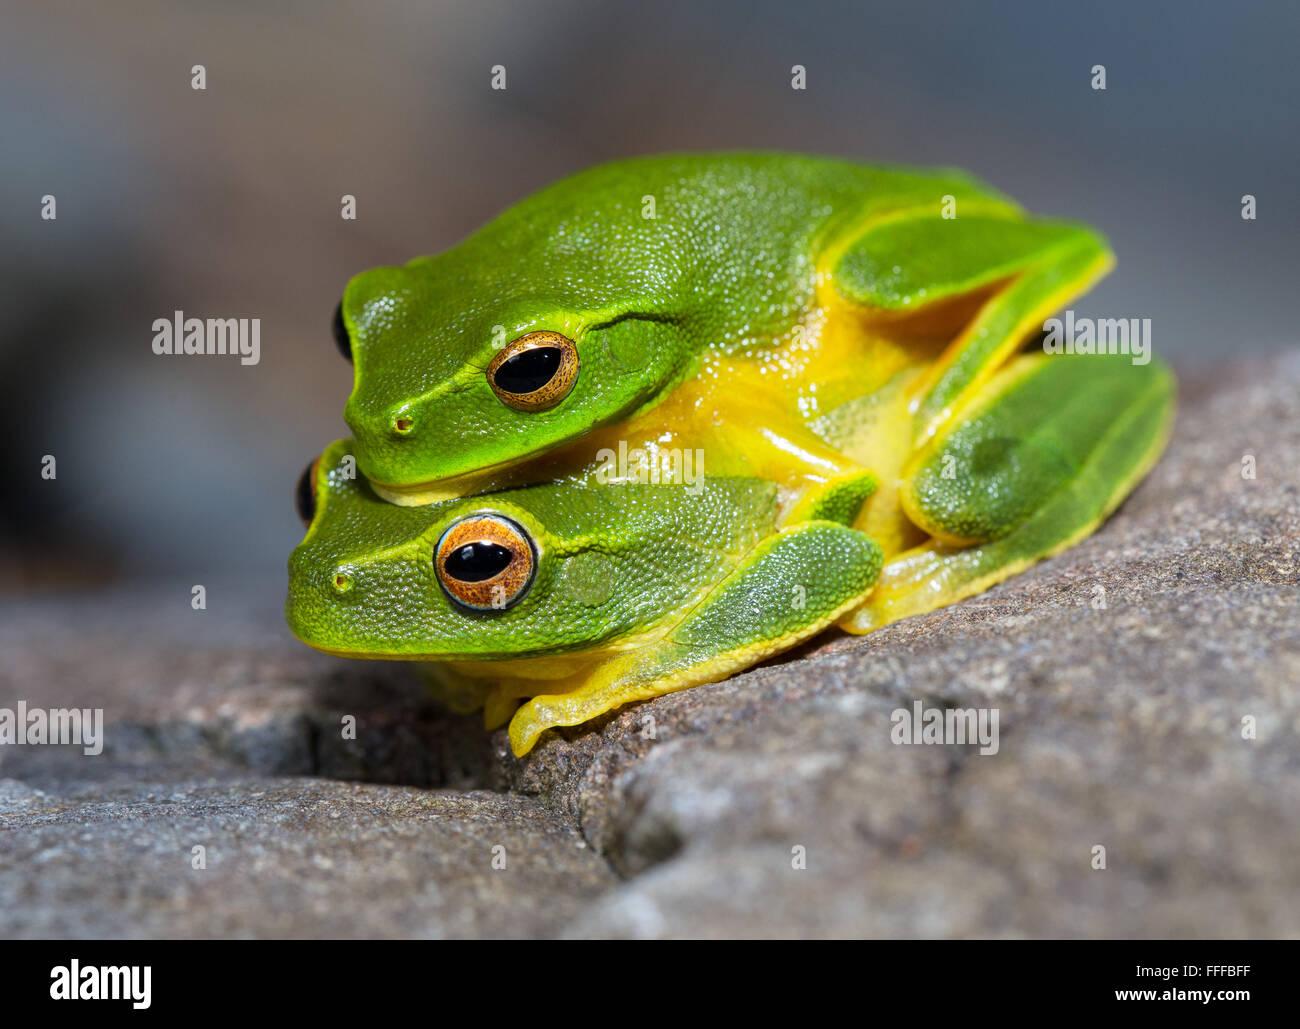 Dainty Green Tree Frog (Litoria gracilenta). also known as Graceful Tree Frog, NSW, Australia - Stock Image